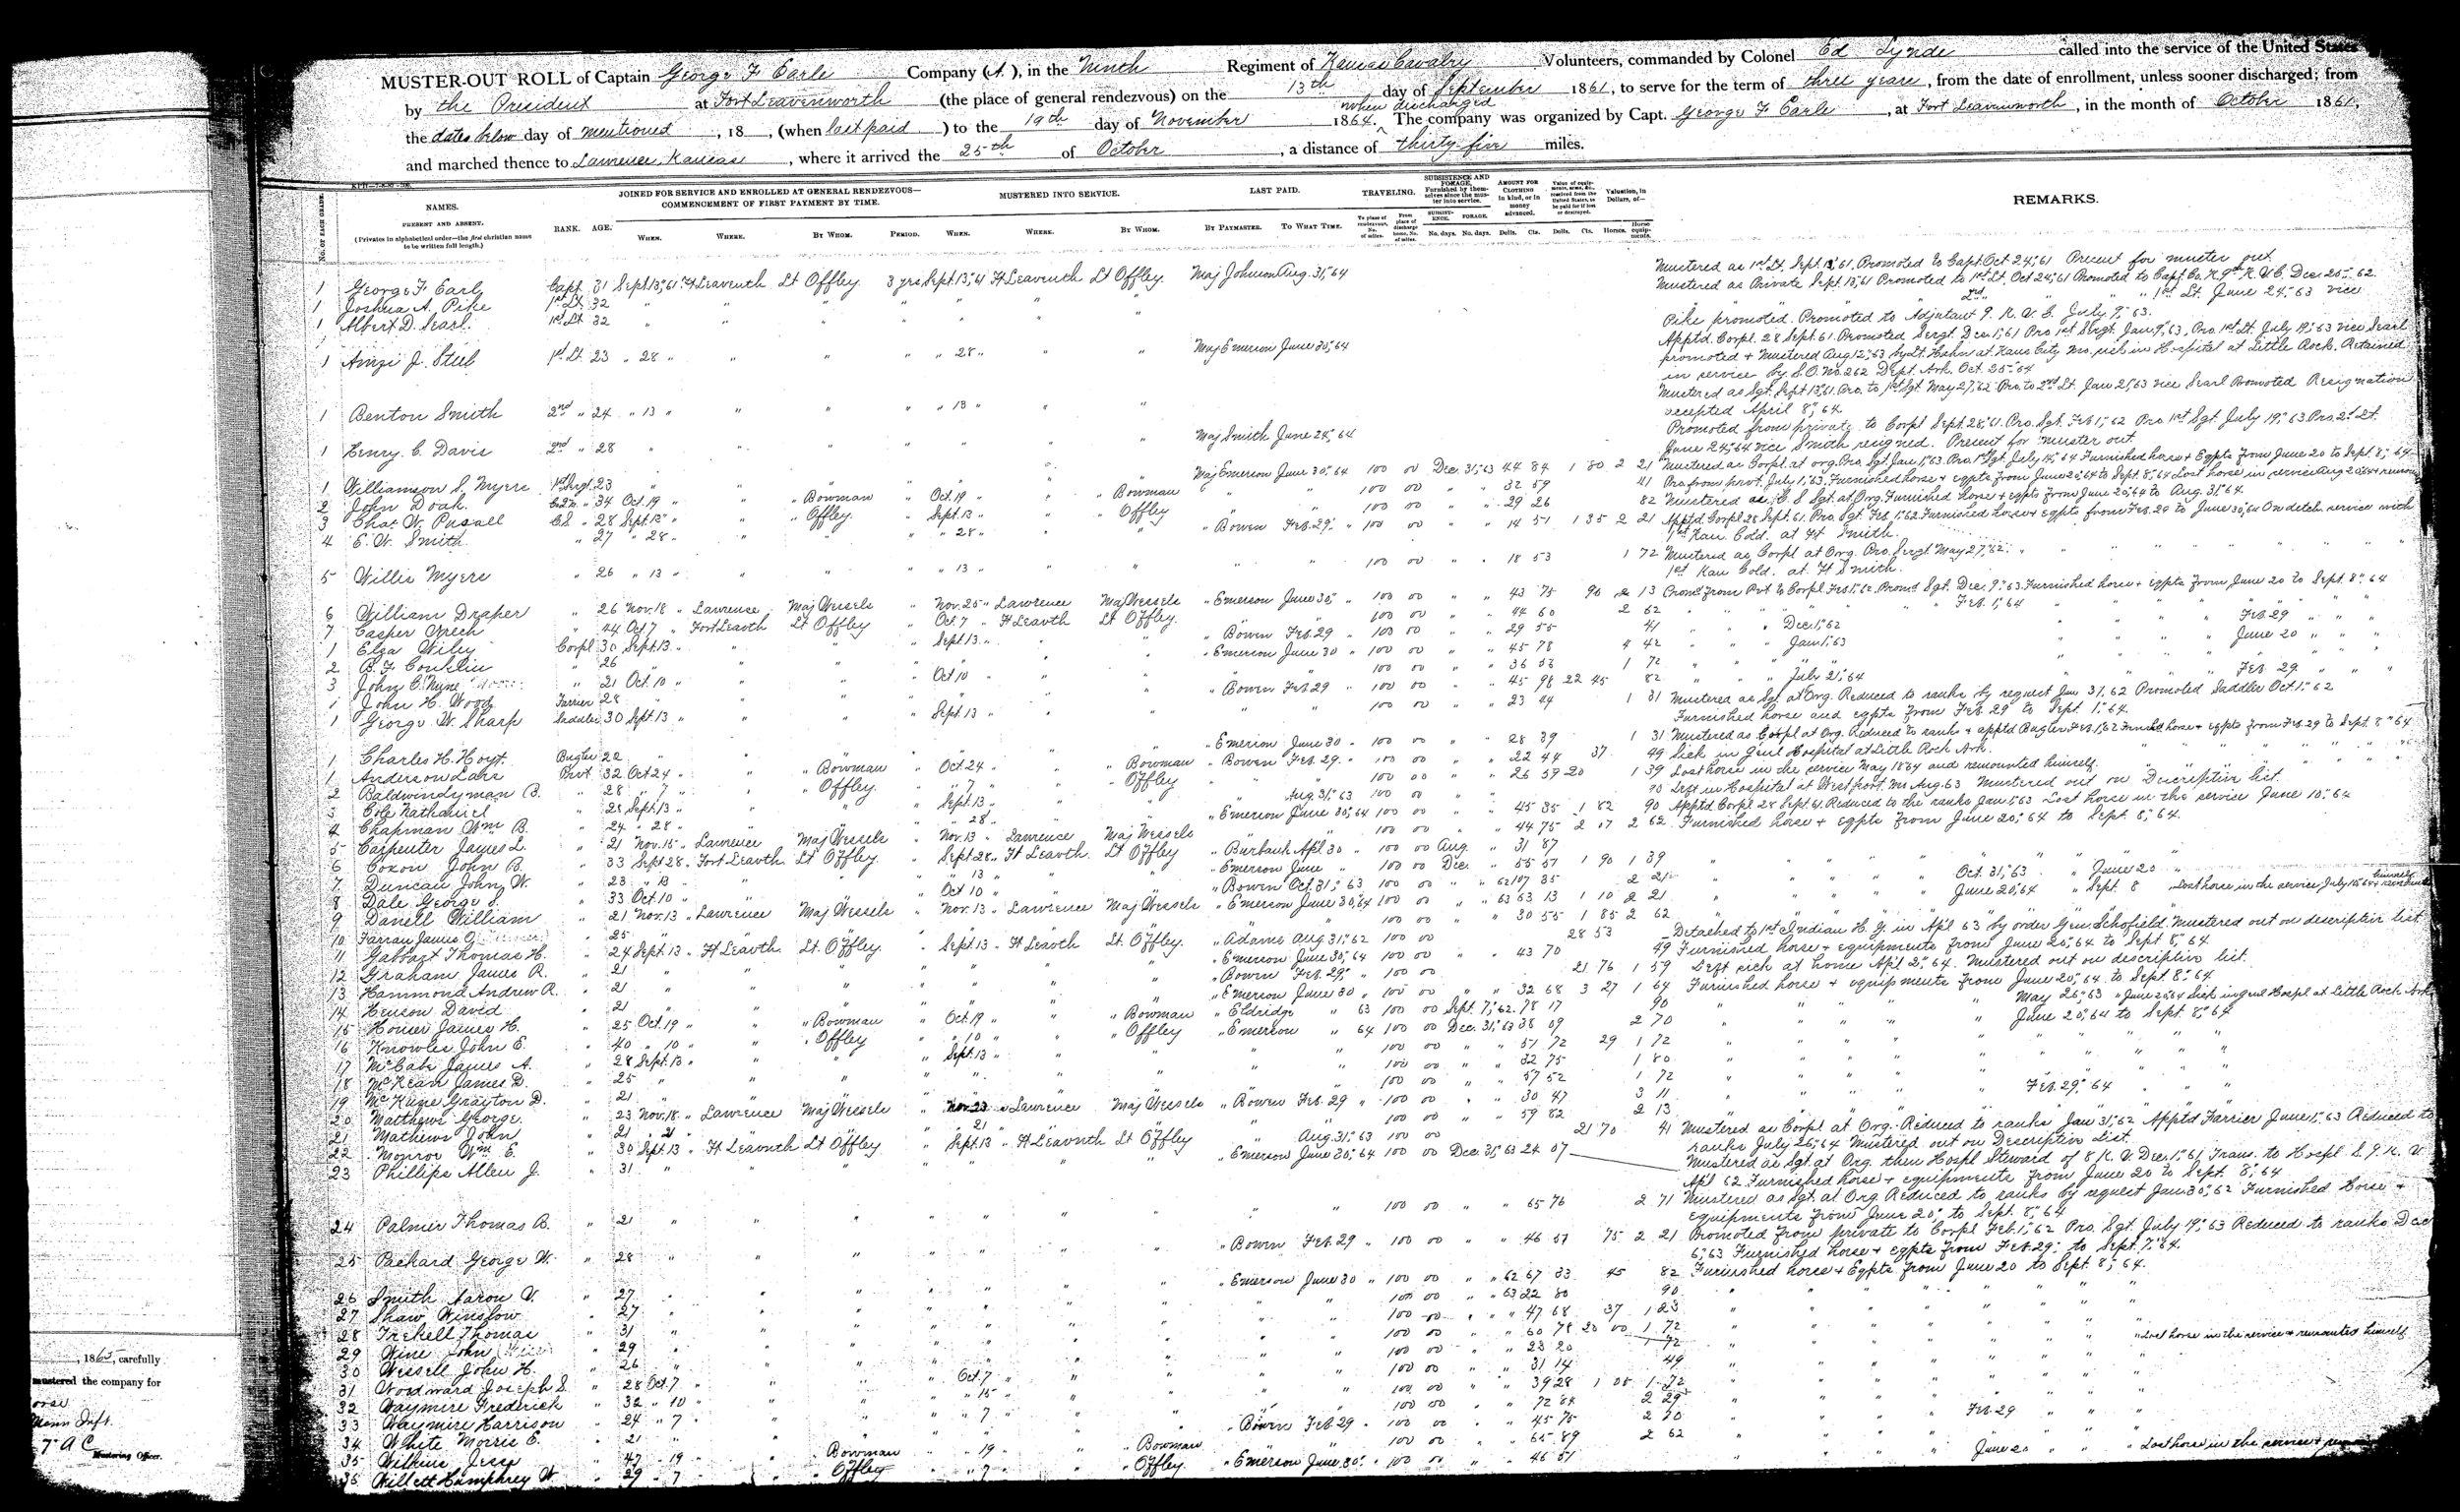 Muster out roll, Ninth Regiment, Cavalry, Kansas Civil War Volunteers regiment, volume 3 - 6